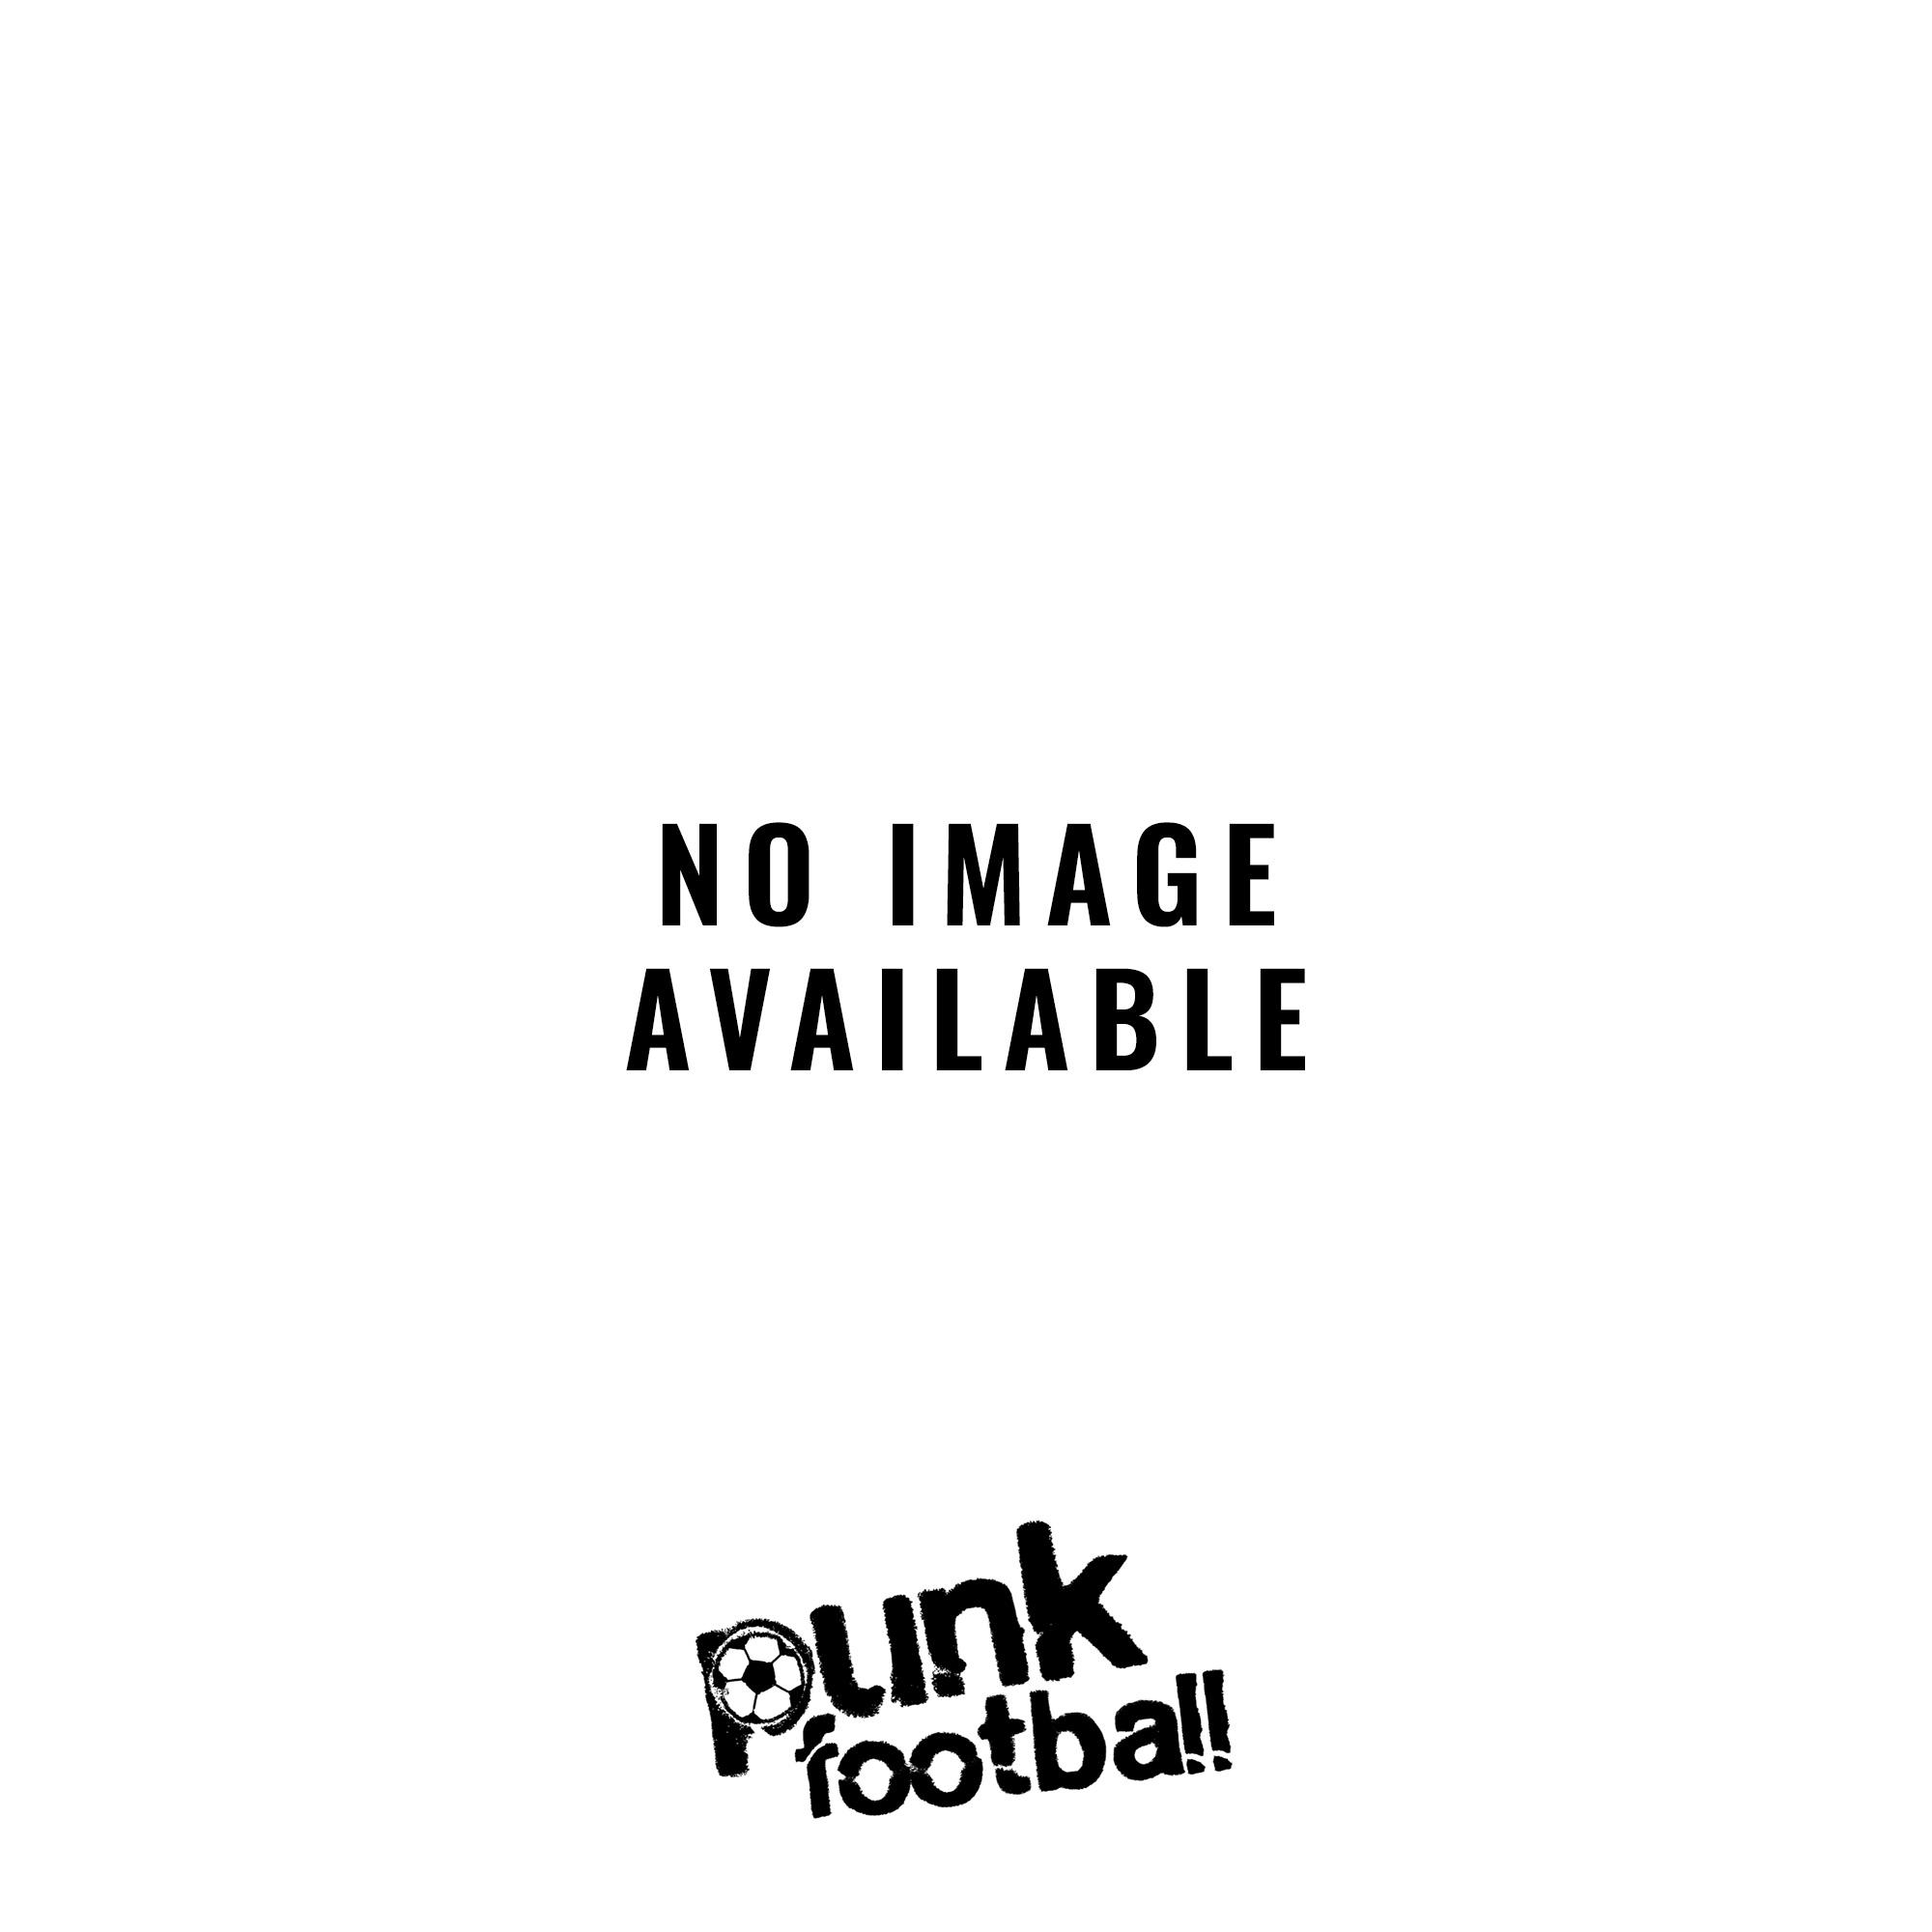 The North West (Blackburn Rovers) Hooded Sweatshirt